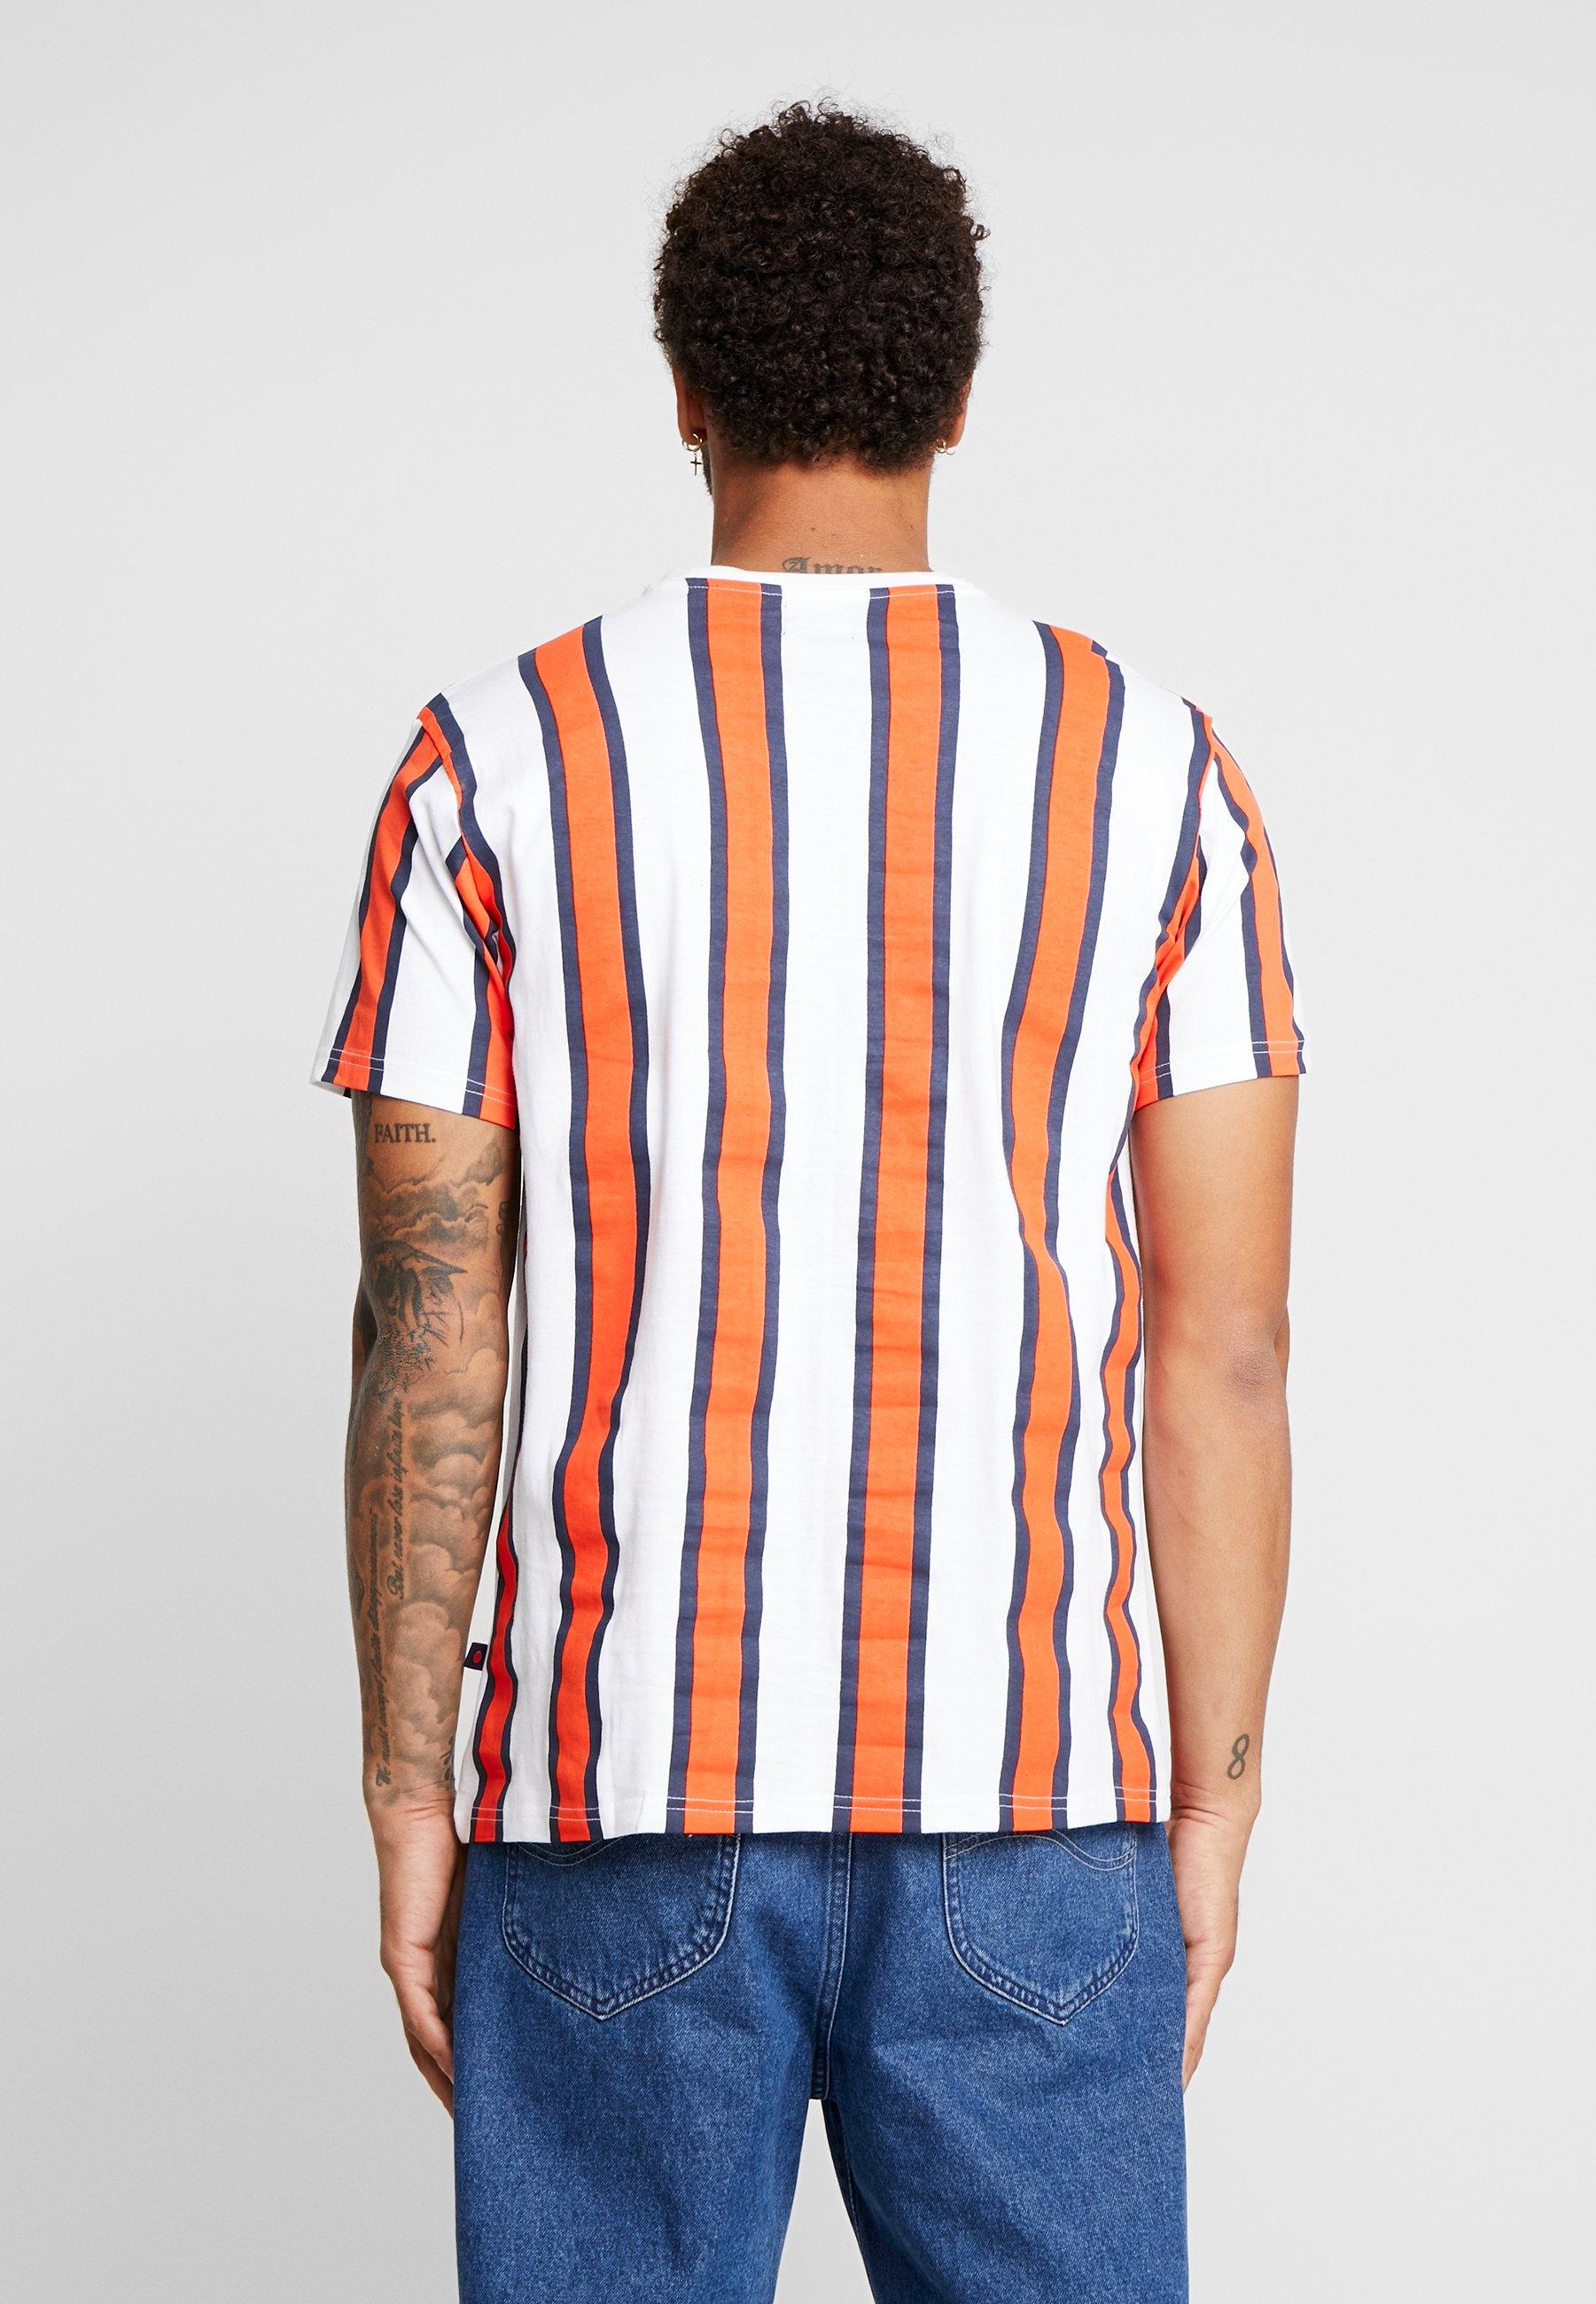 TeeT Stampa Denim shirt Mulit Project White Con D9YHIeWE2